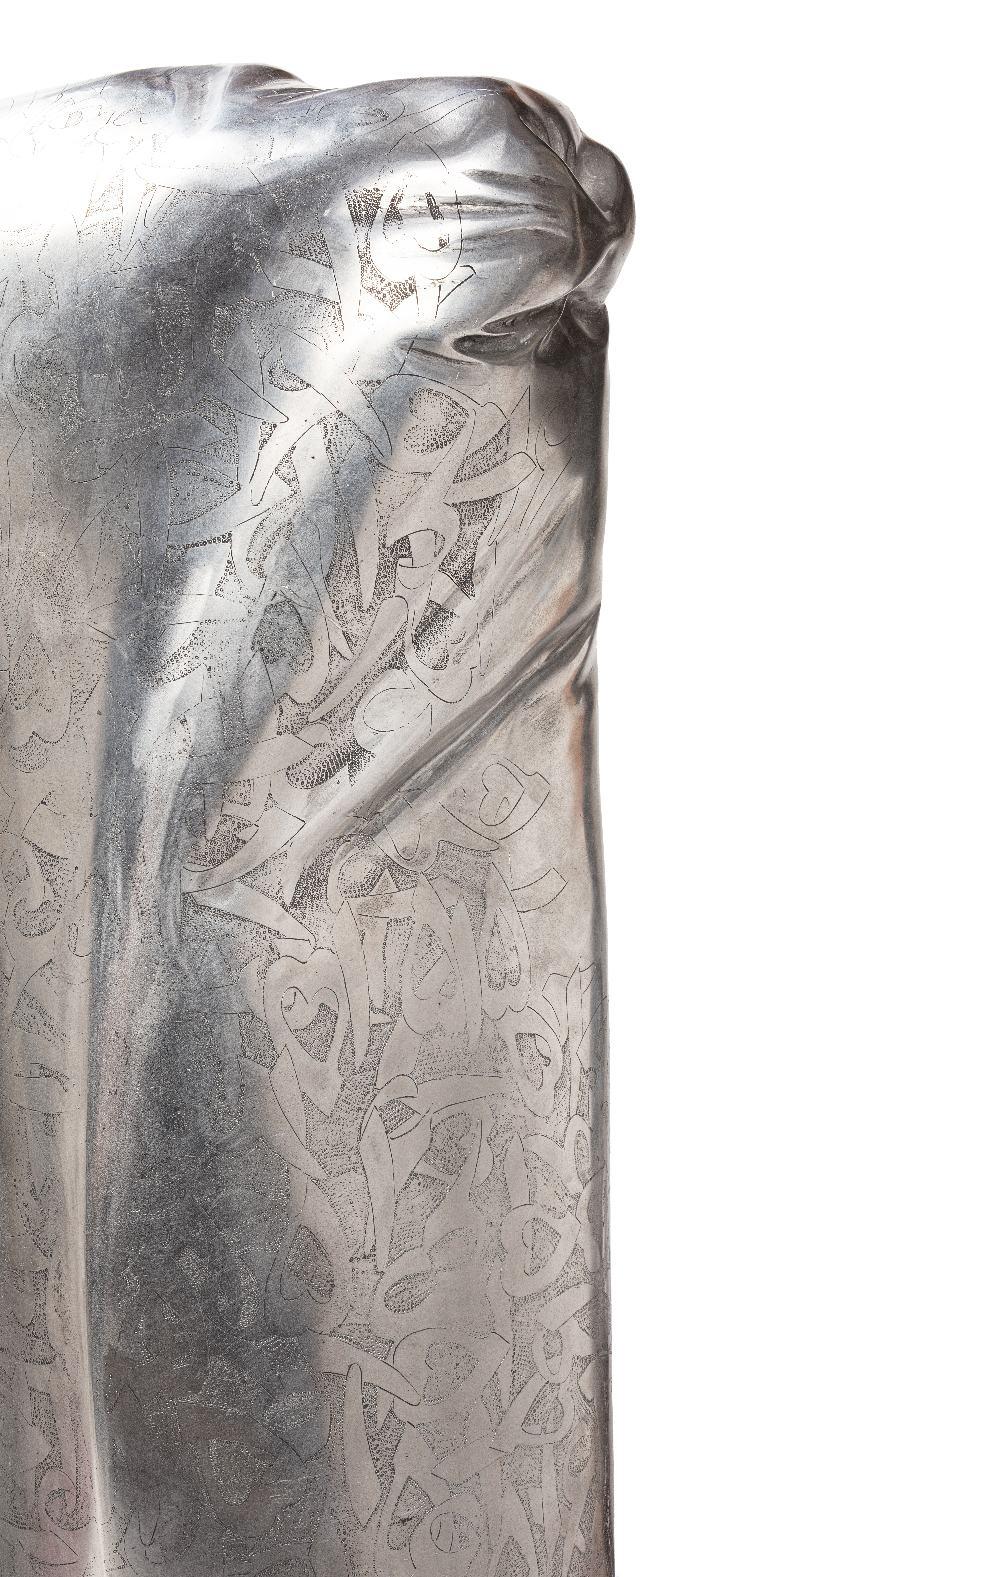 Mohammad REZA KHALAJI (Téhéran 1974)Sans titre, 2017Aluminium 81,5 x 32,5 x 20 cm Edition 1/8 Signé, - Image 5 of 5